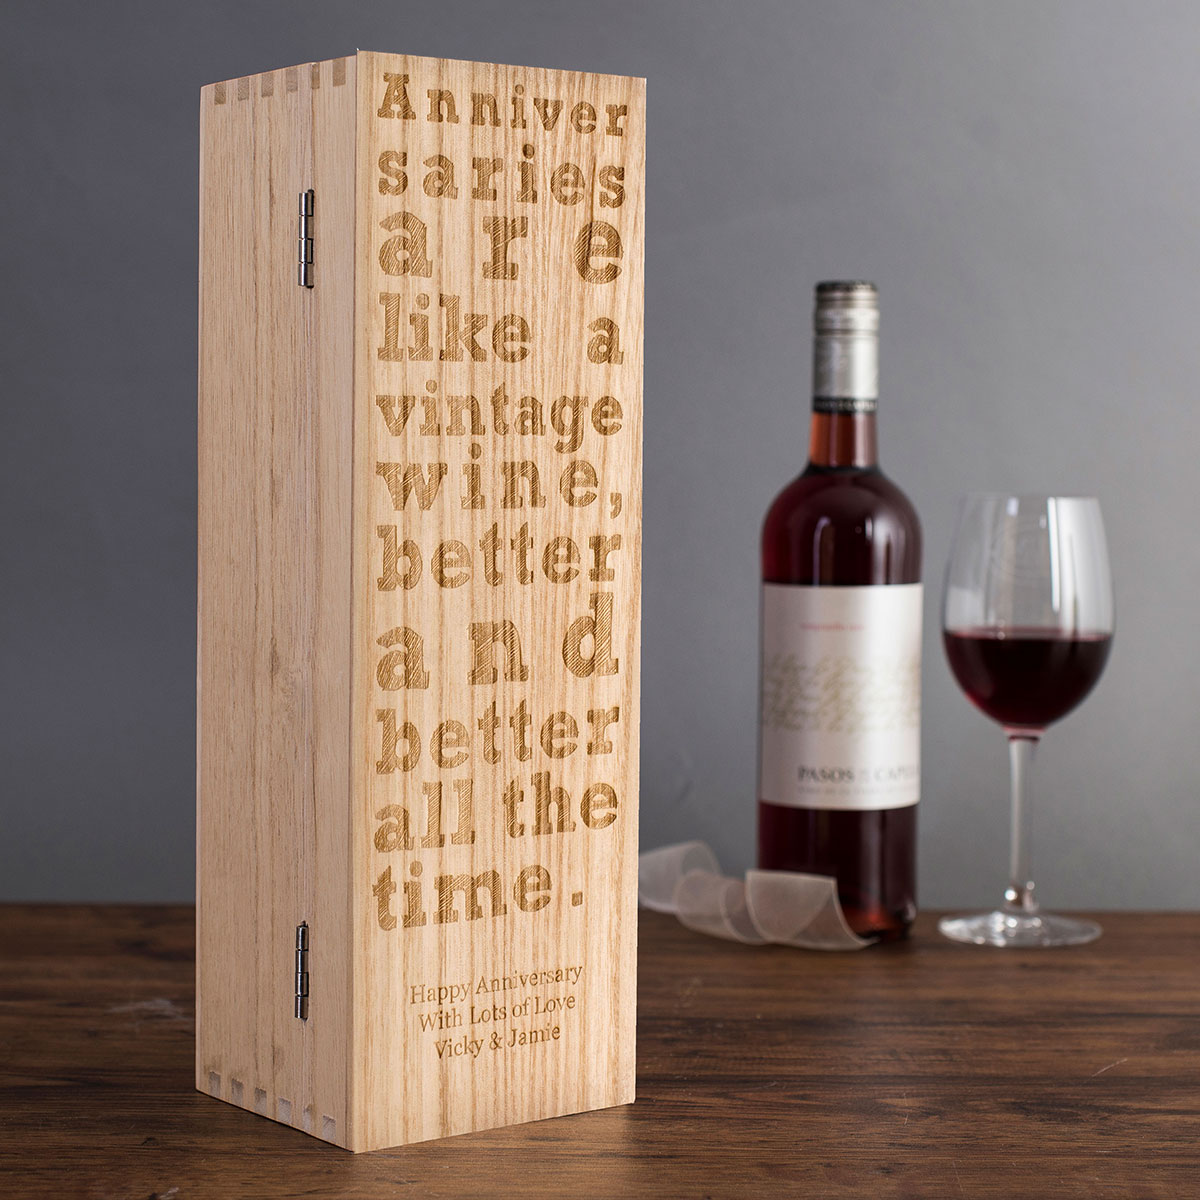 Personalised Luxury Wooden Wine Box Anniversary Design